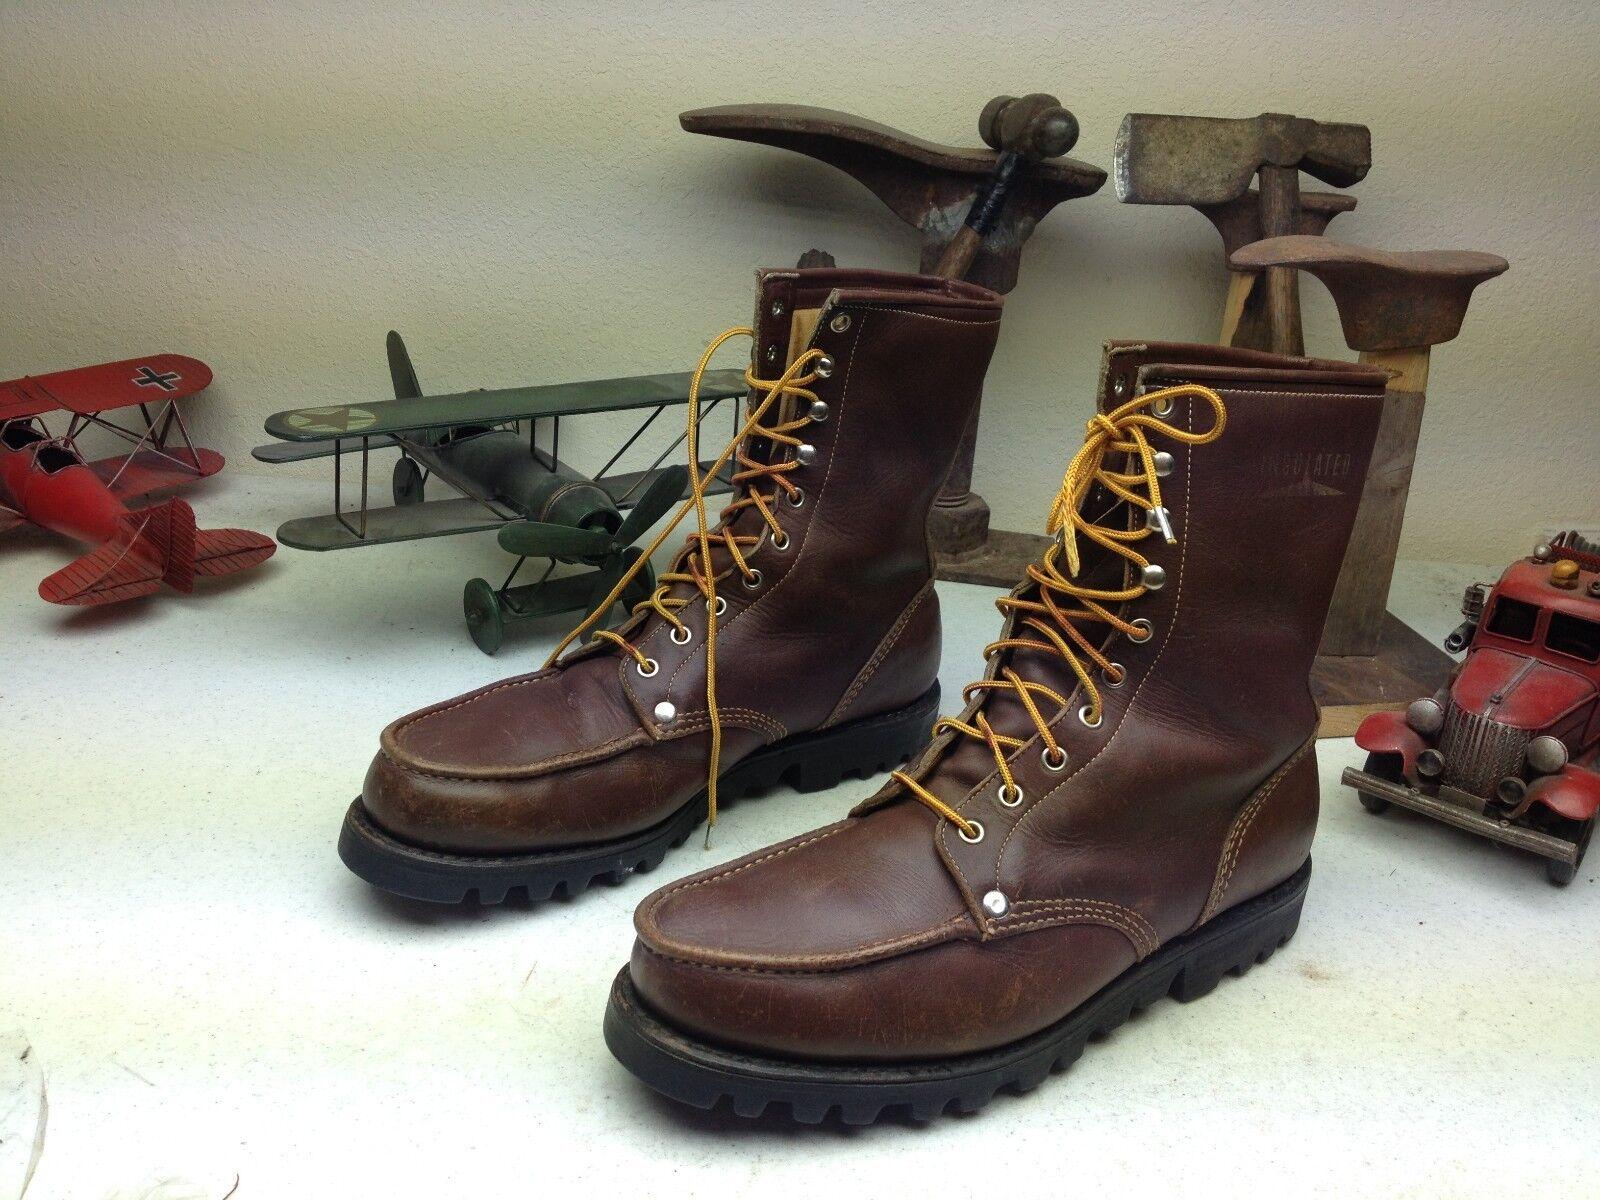 Vintage Marrón Envejecido lazada Ingeniero Packer Trail Boss botas D